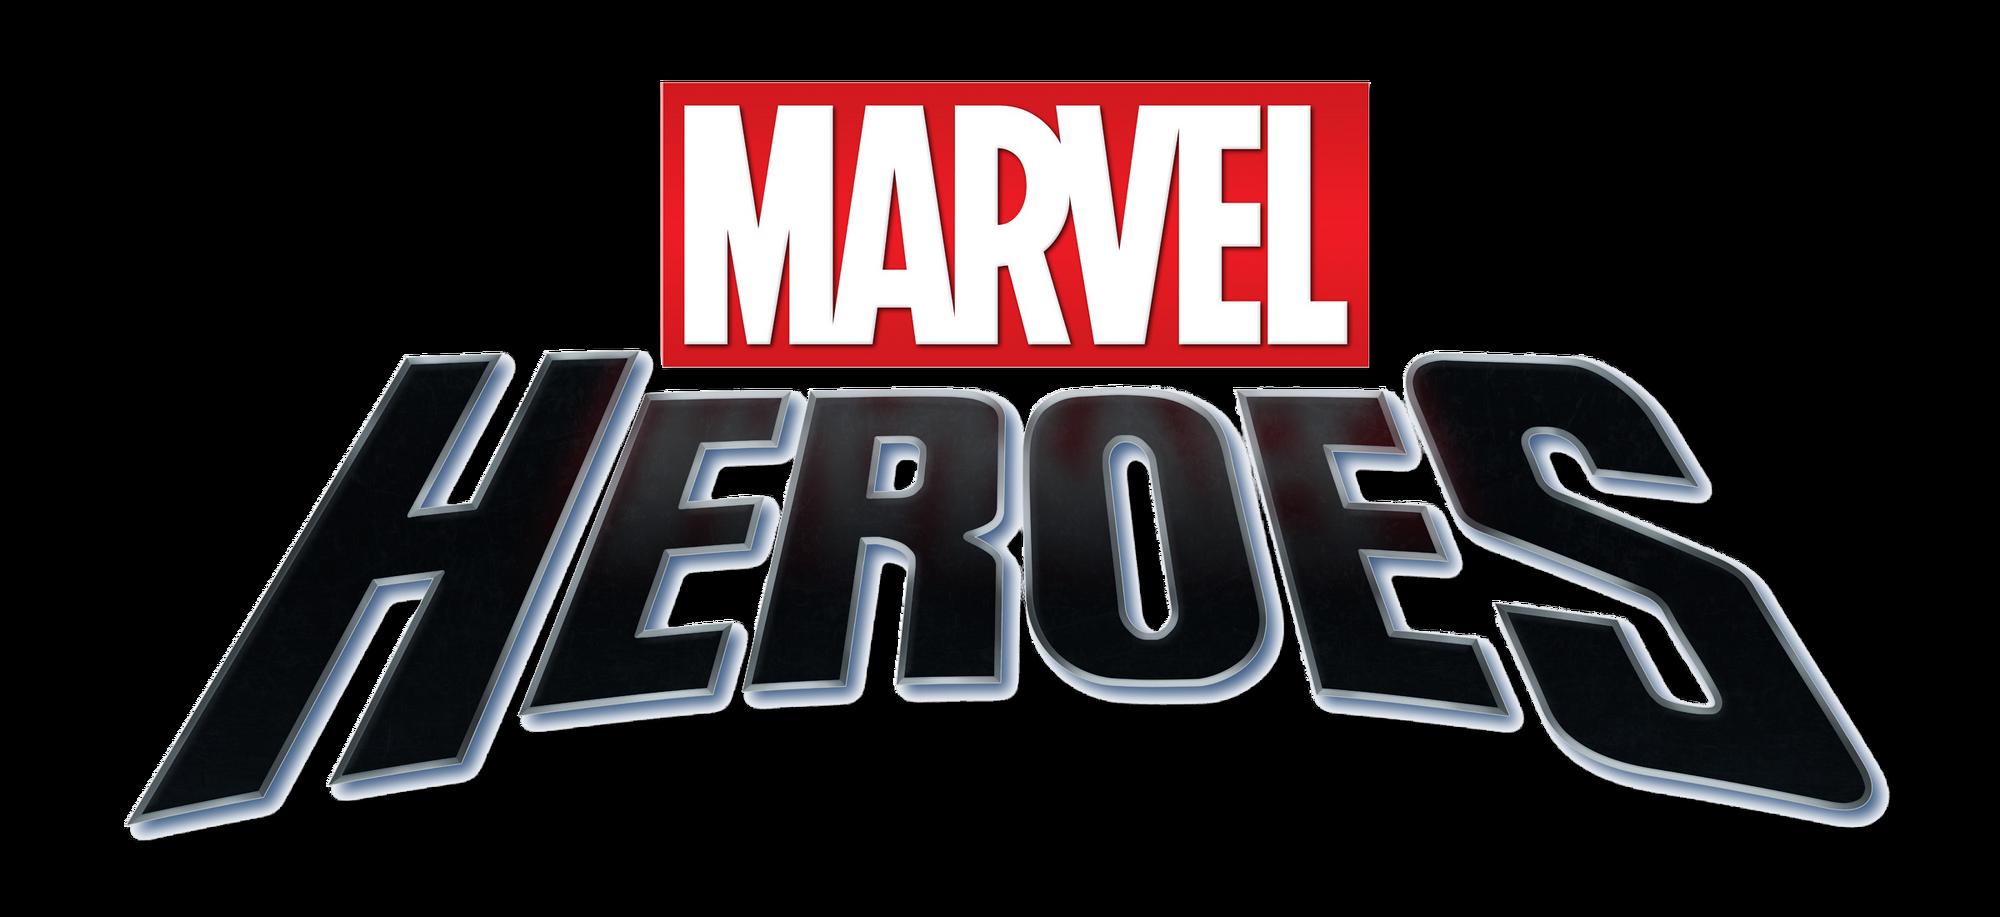 Image - Marvel heroes.png | LOGO Comics Wiki | FANDOM ...